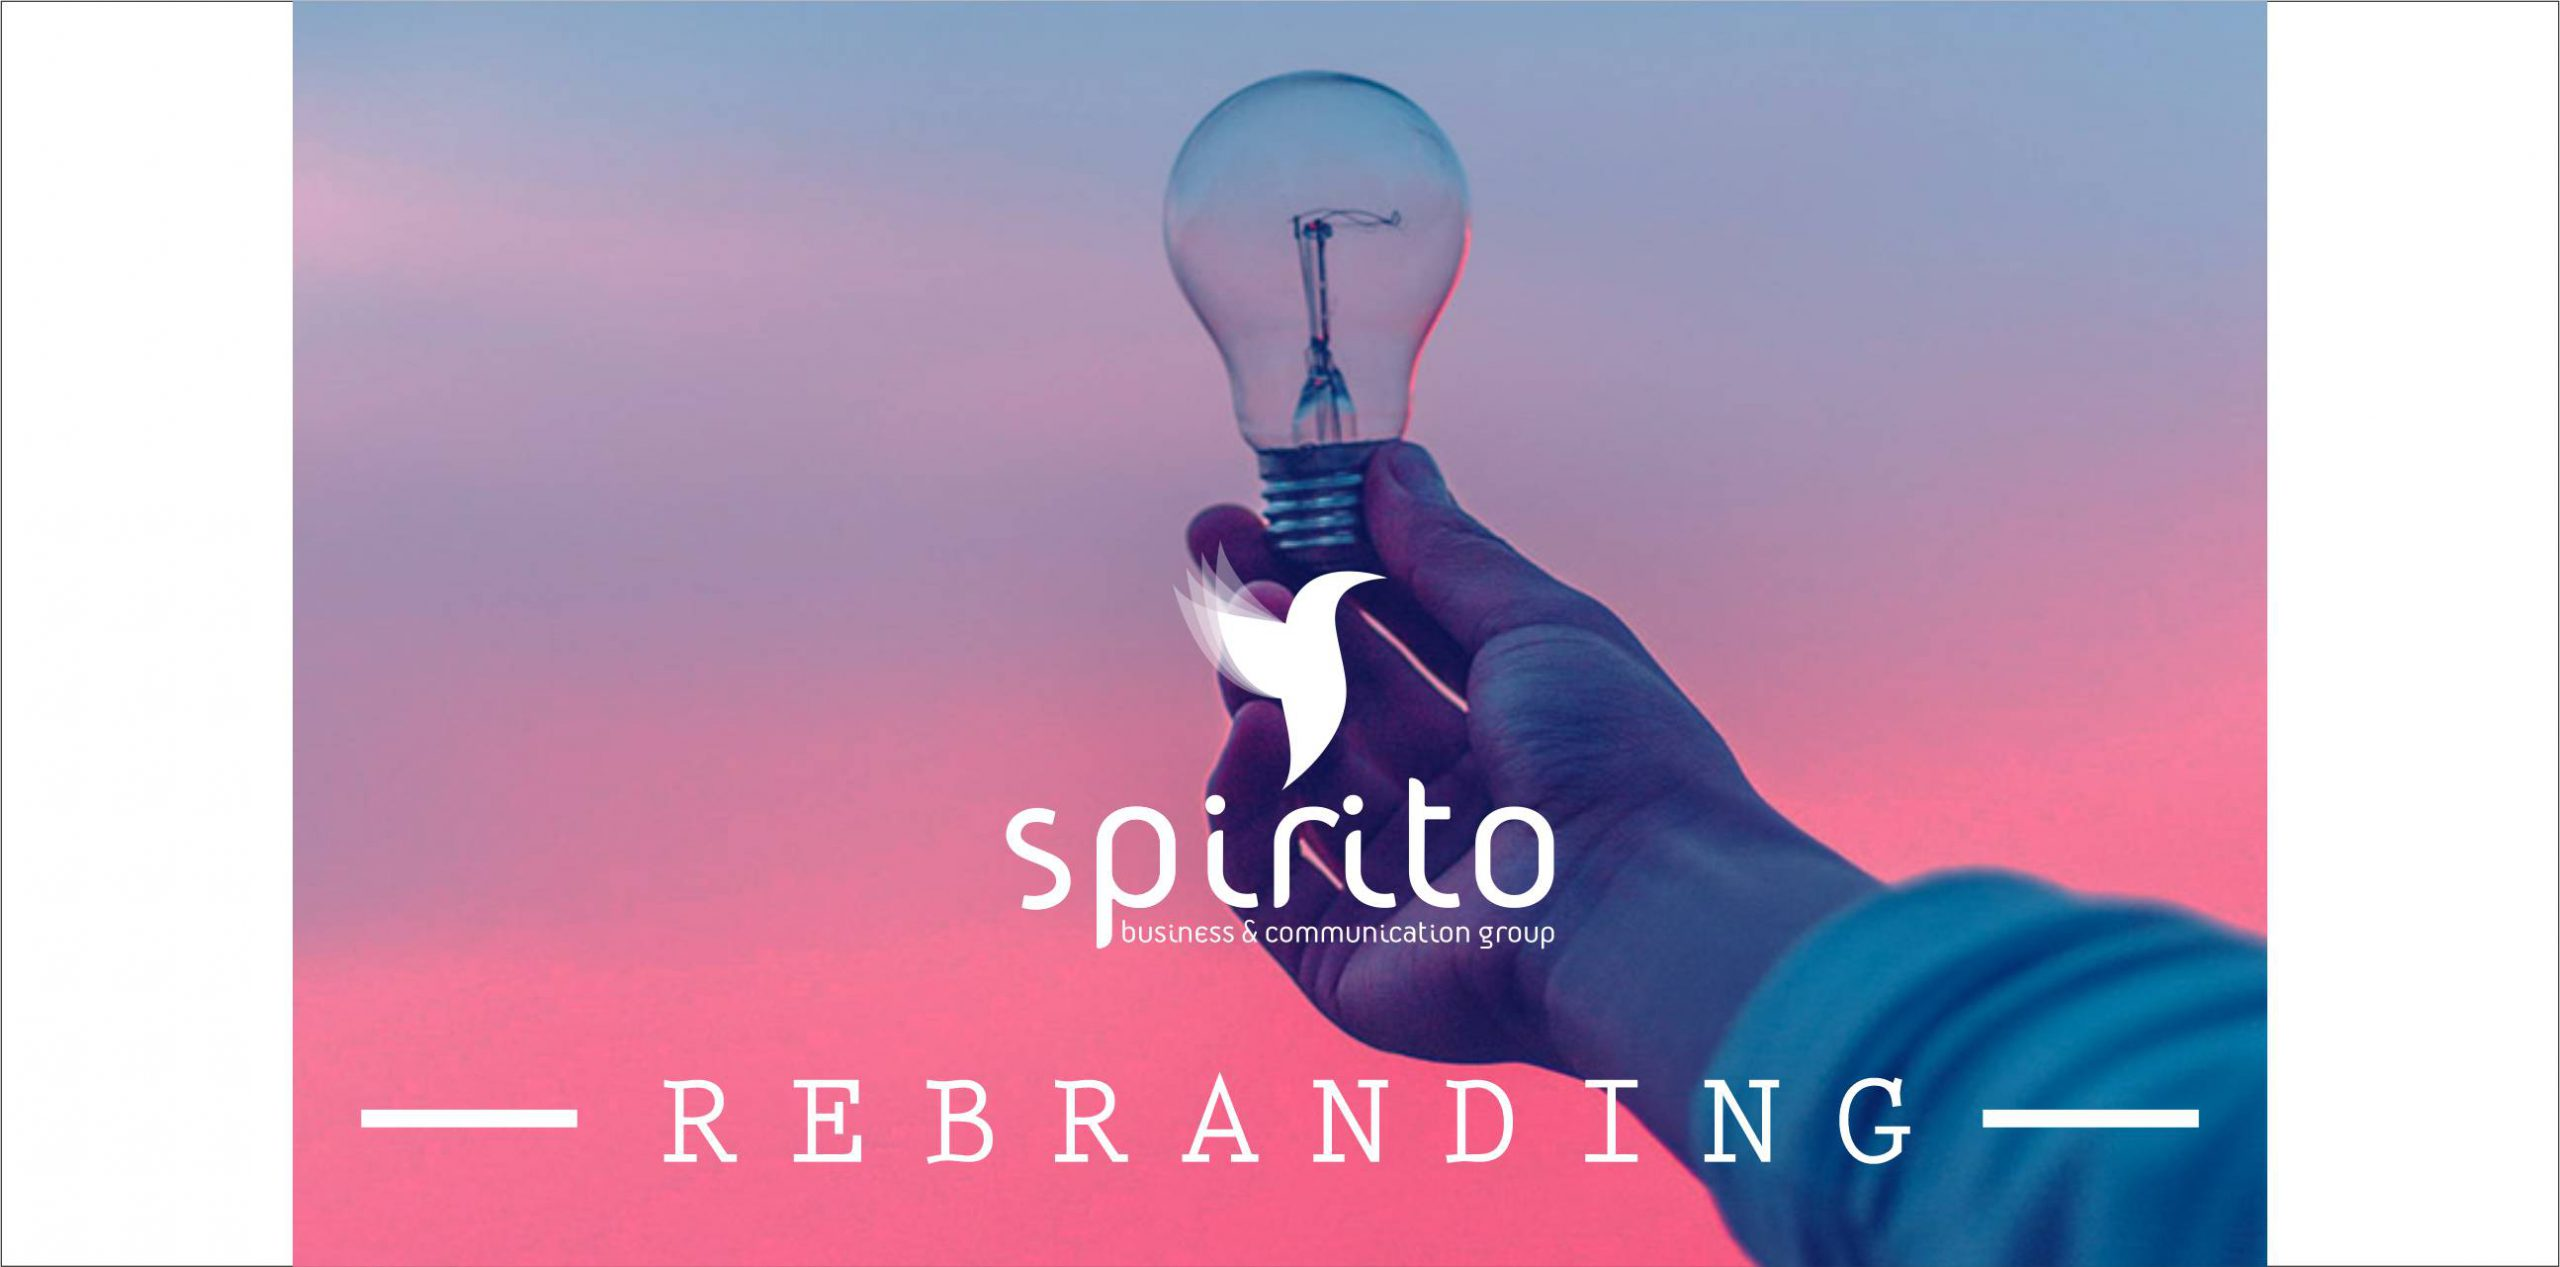 site rebranding presentation news1 scaled